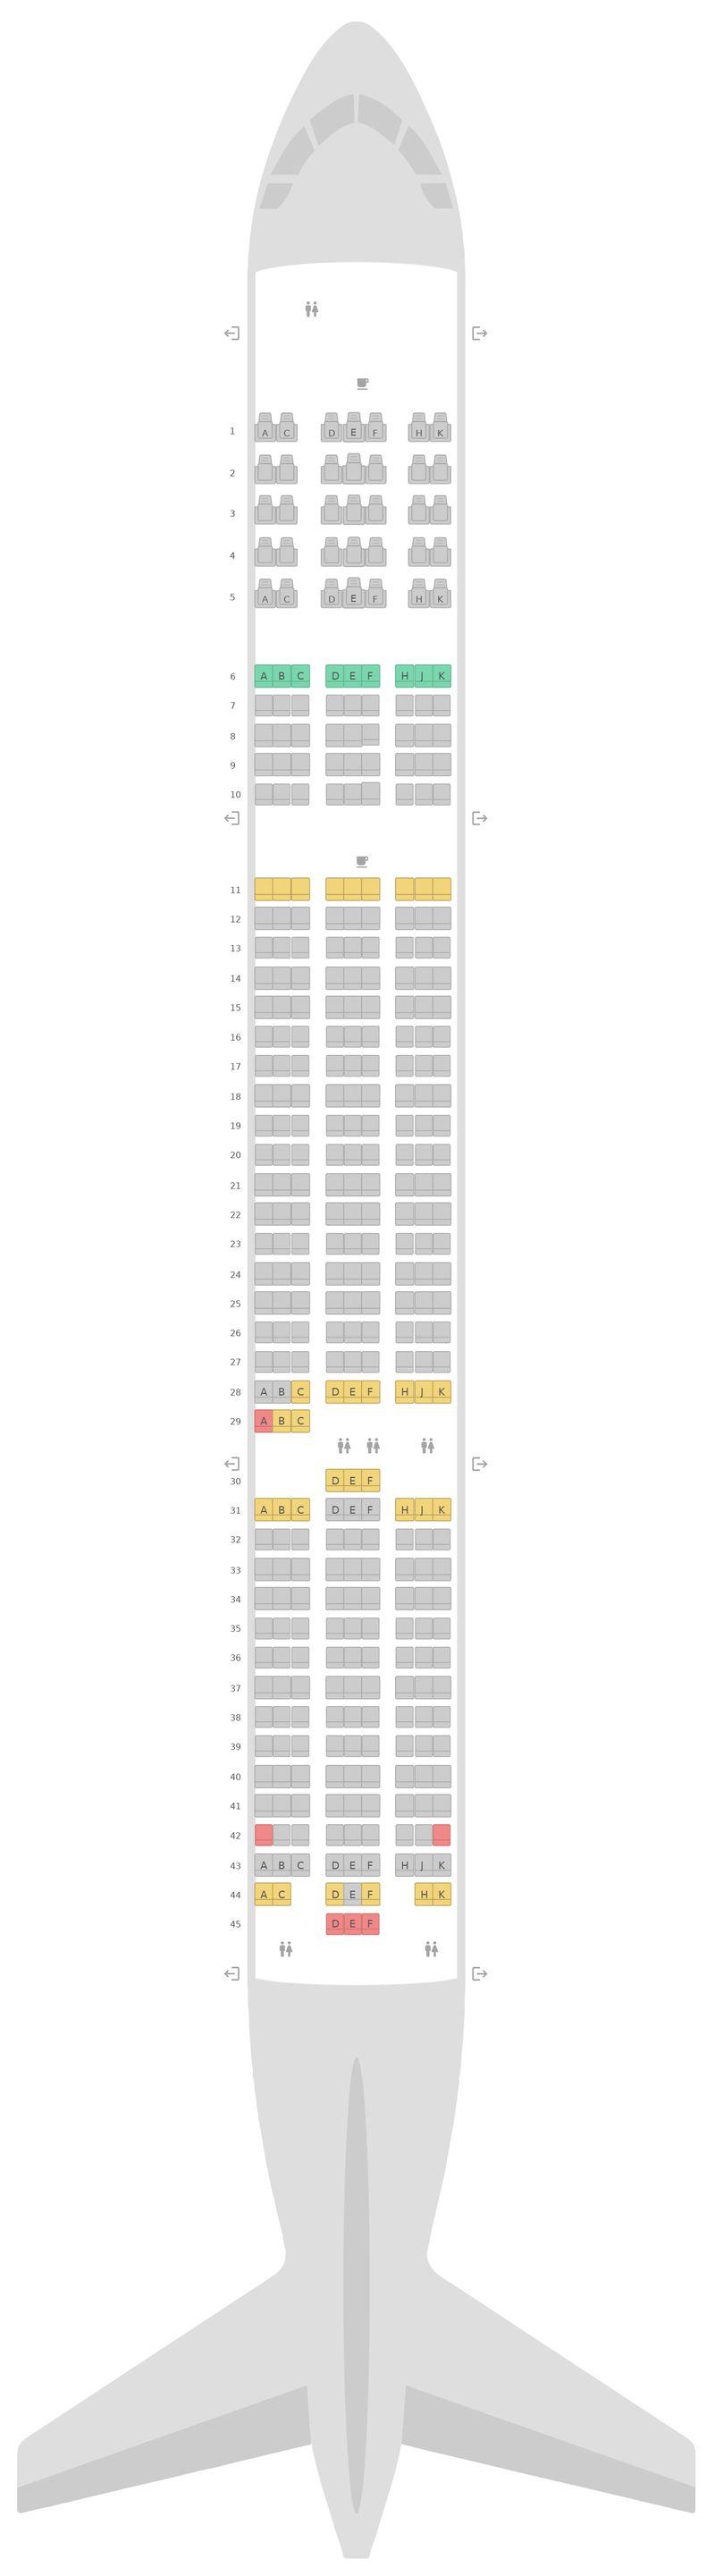 Mapa de asientos Boeing 787-9 (789) Scoot